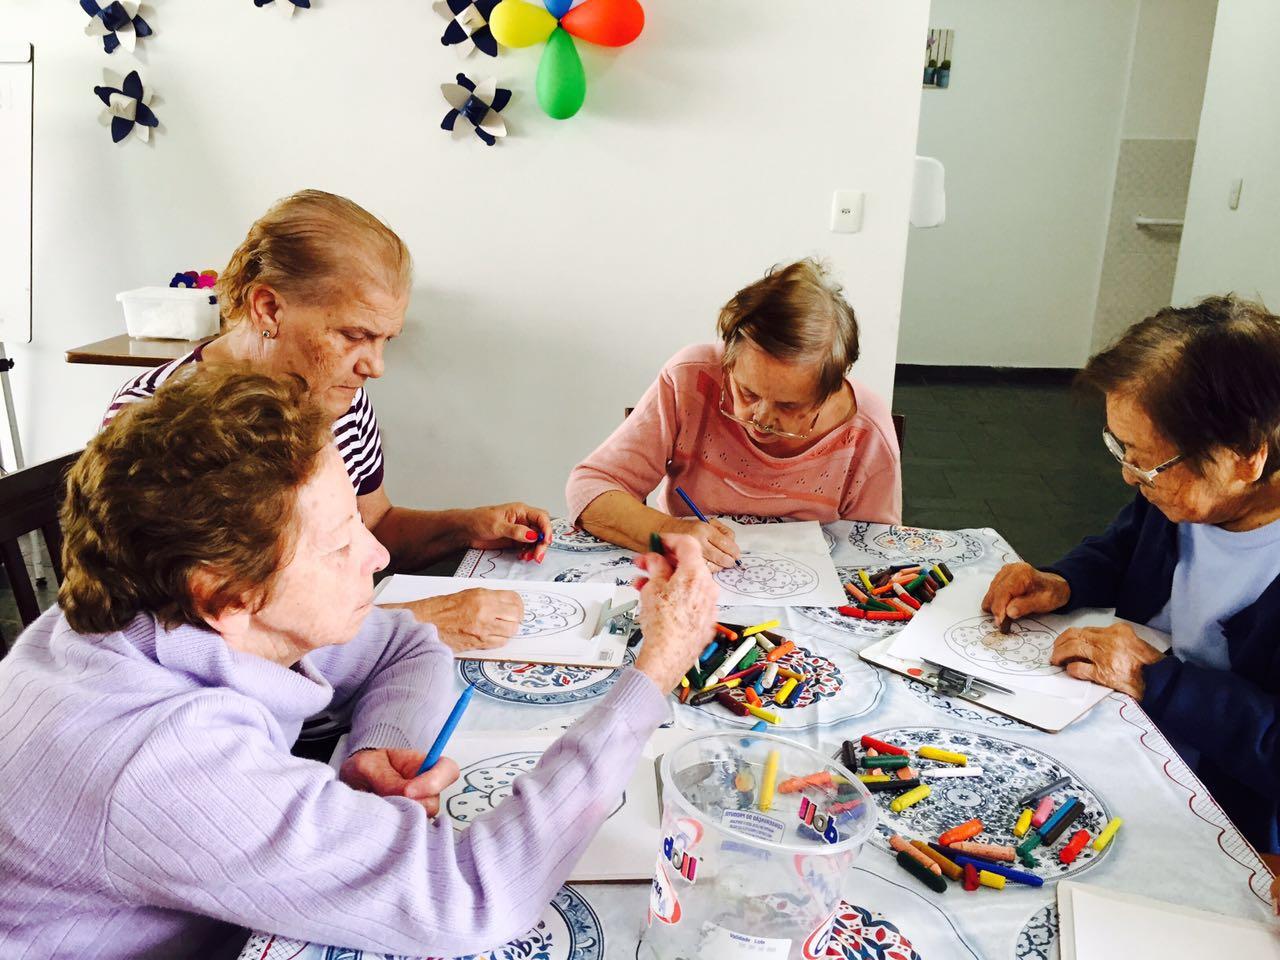 Super Atividades Recreativas Para idosos - Residência Primaveras NL24